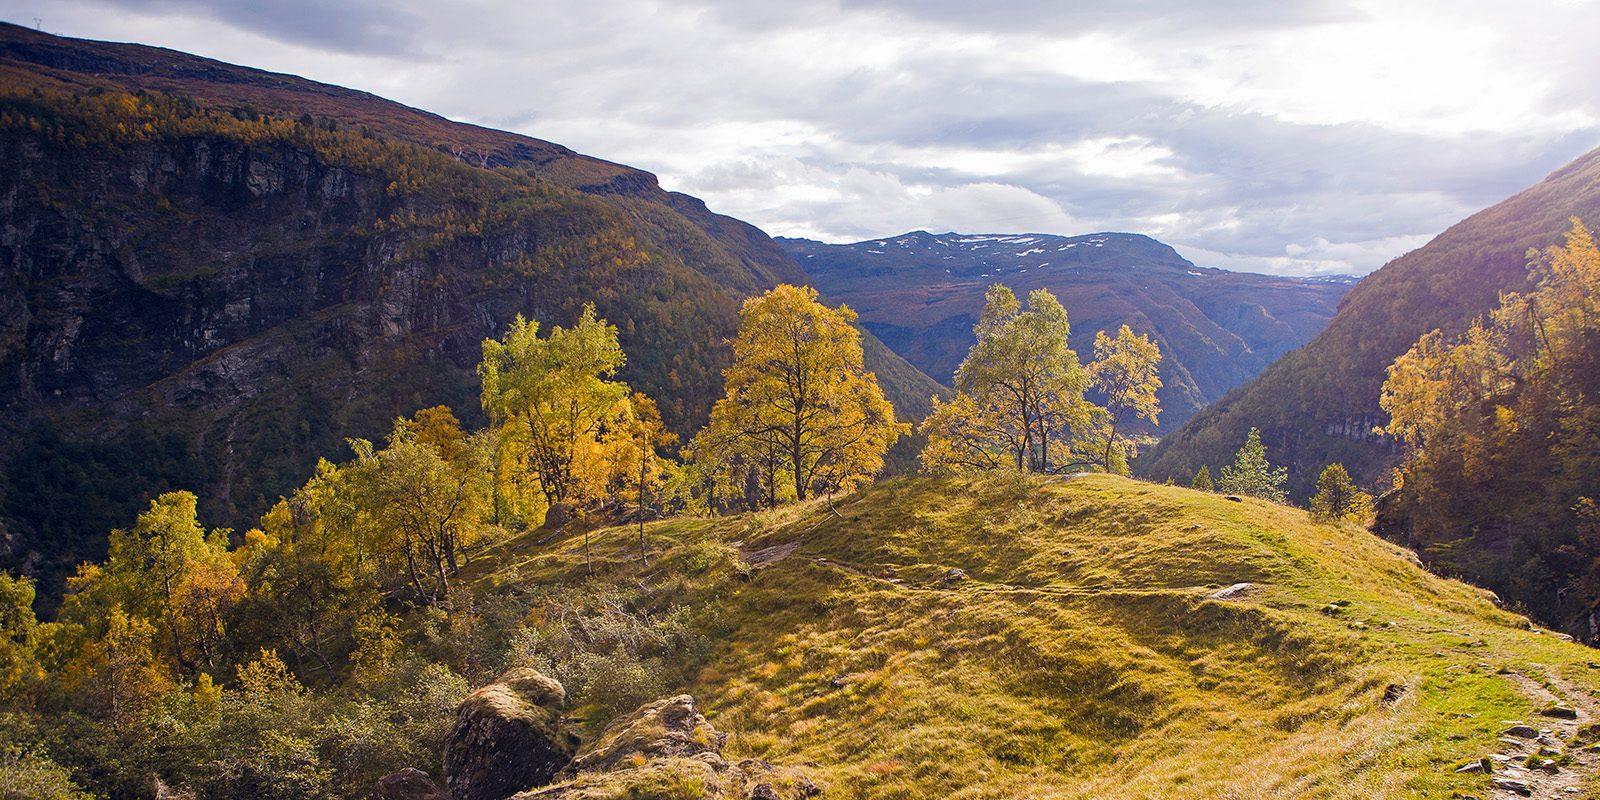 Høstfarger i Mørkridsdalen av Henning Mella